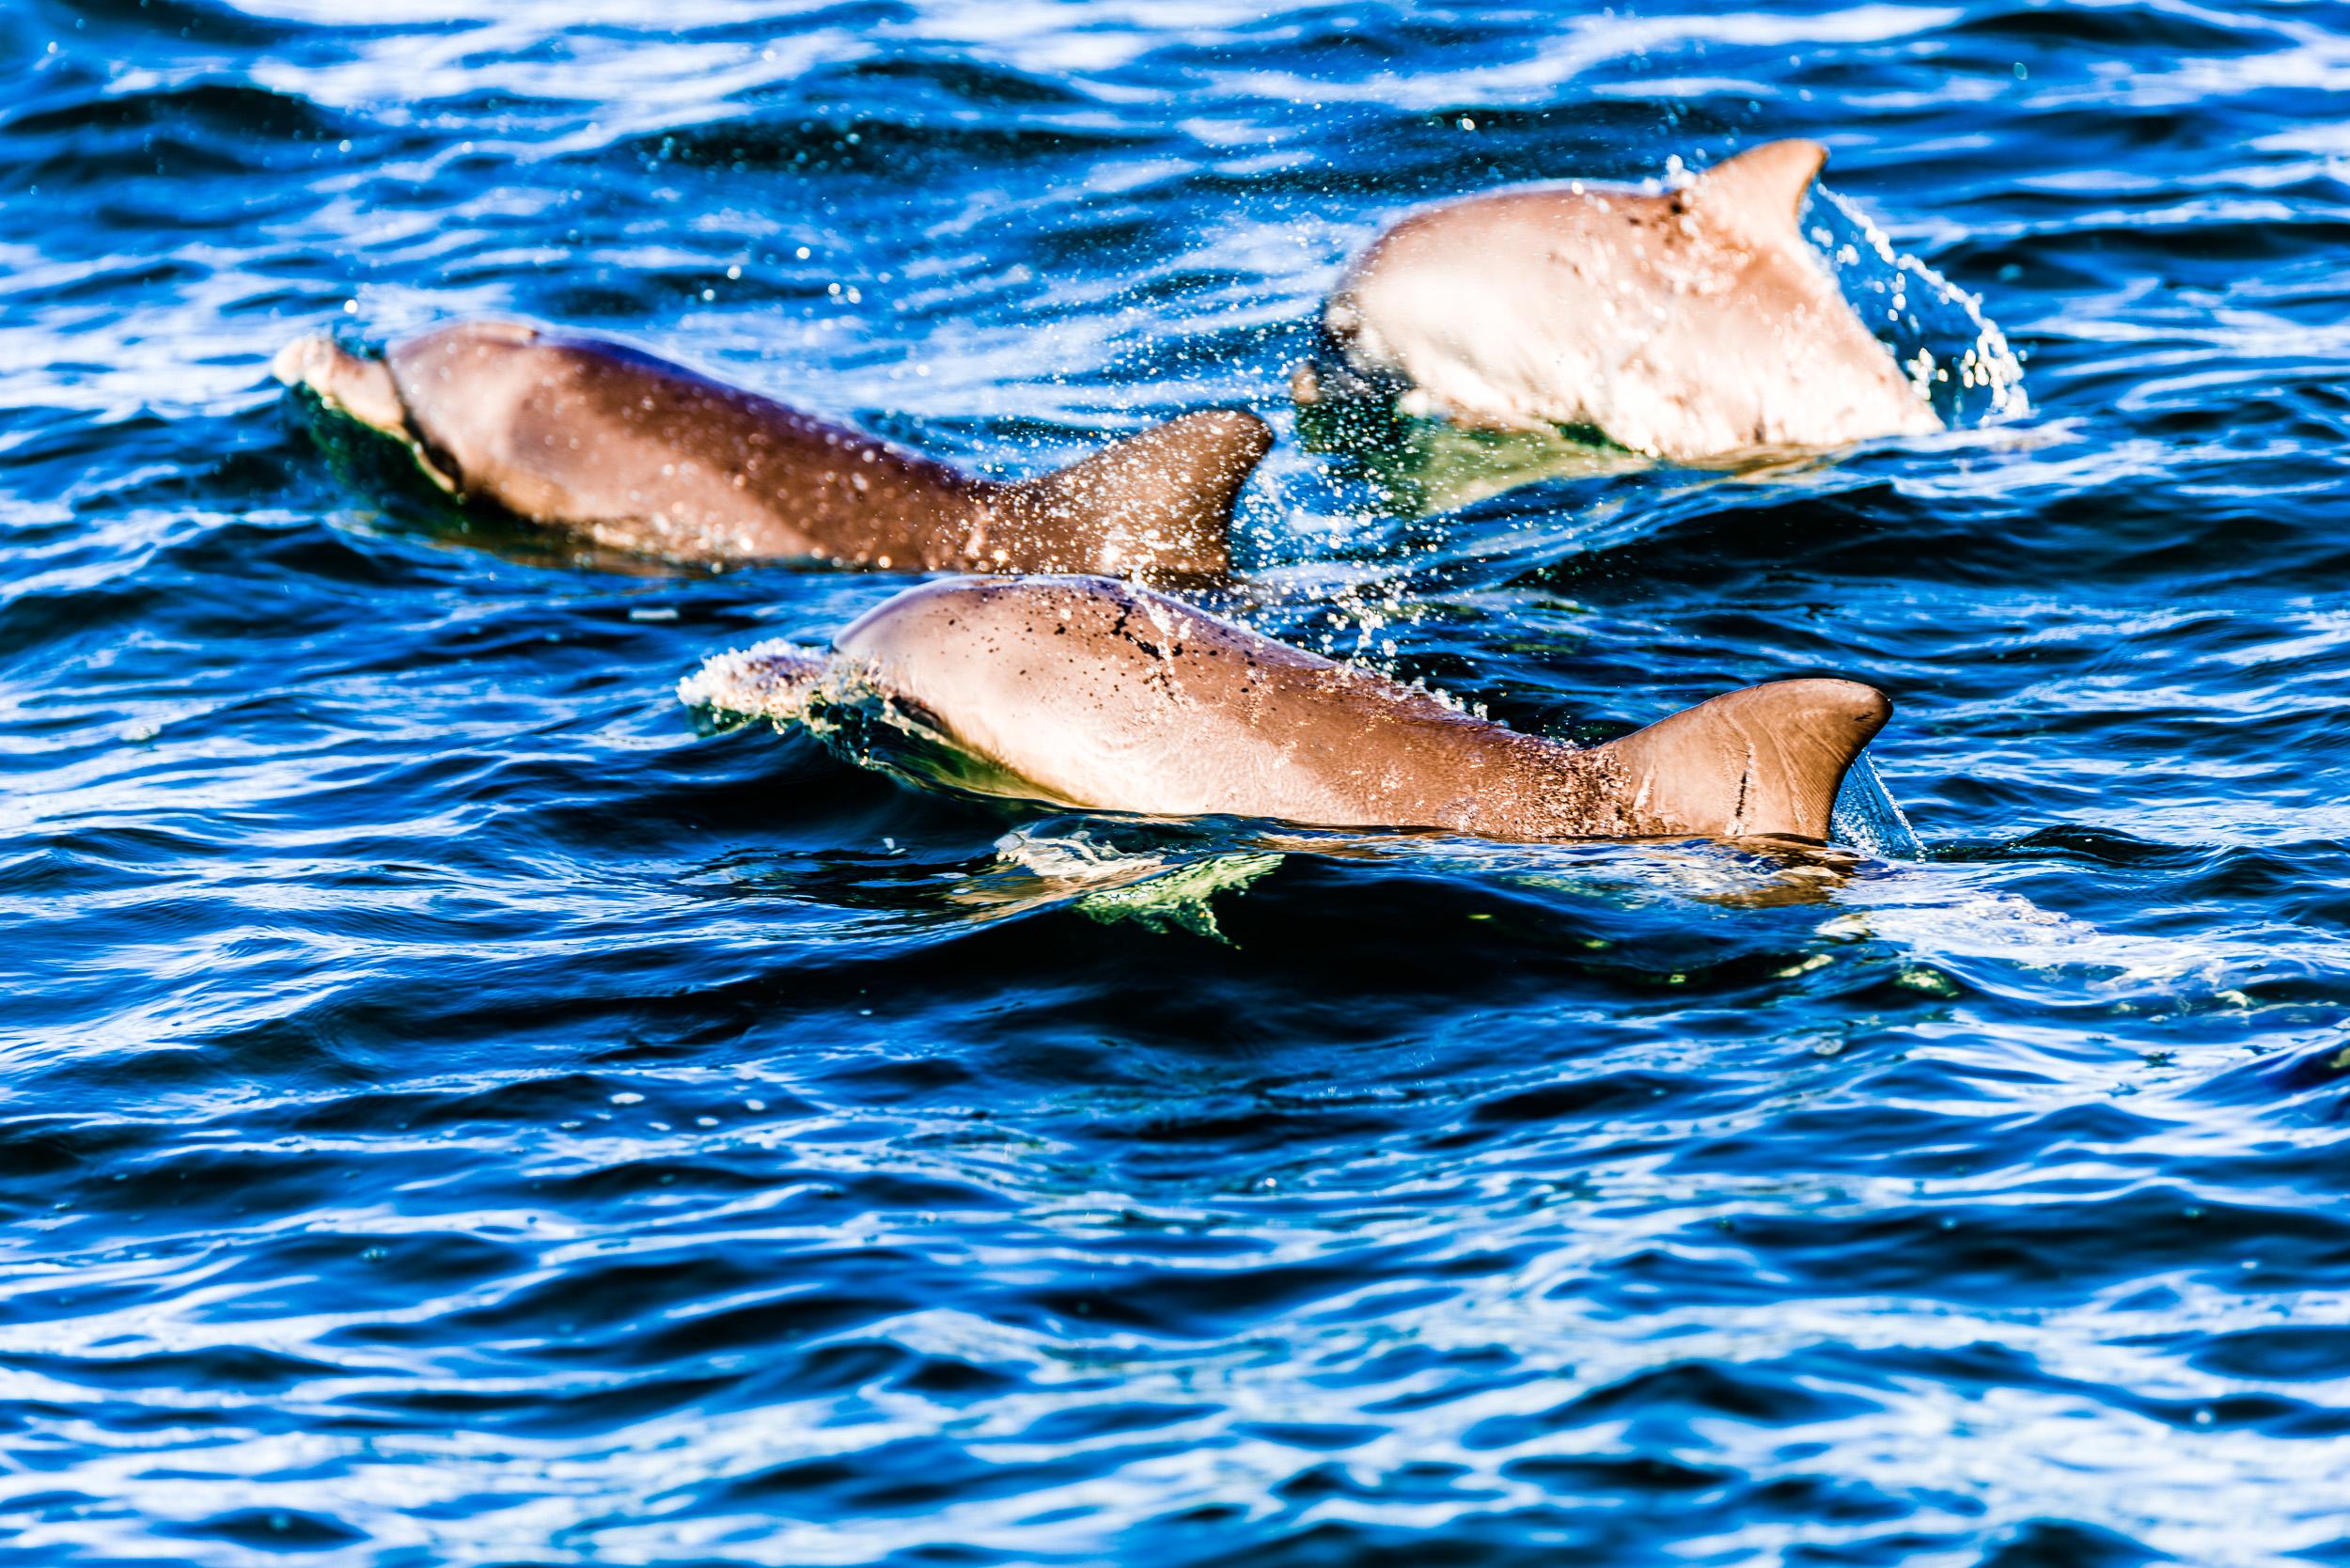 Spyrides_Kyle_Dolphin_Swimming_Rockingham_DSC2698.jpg